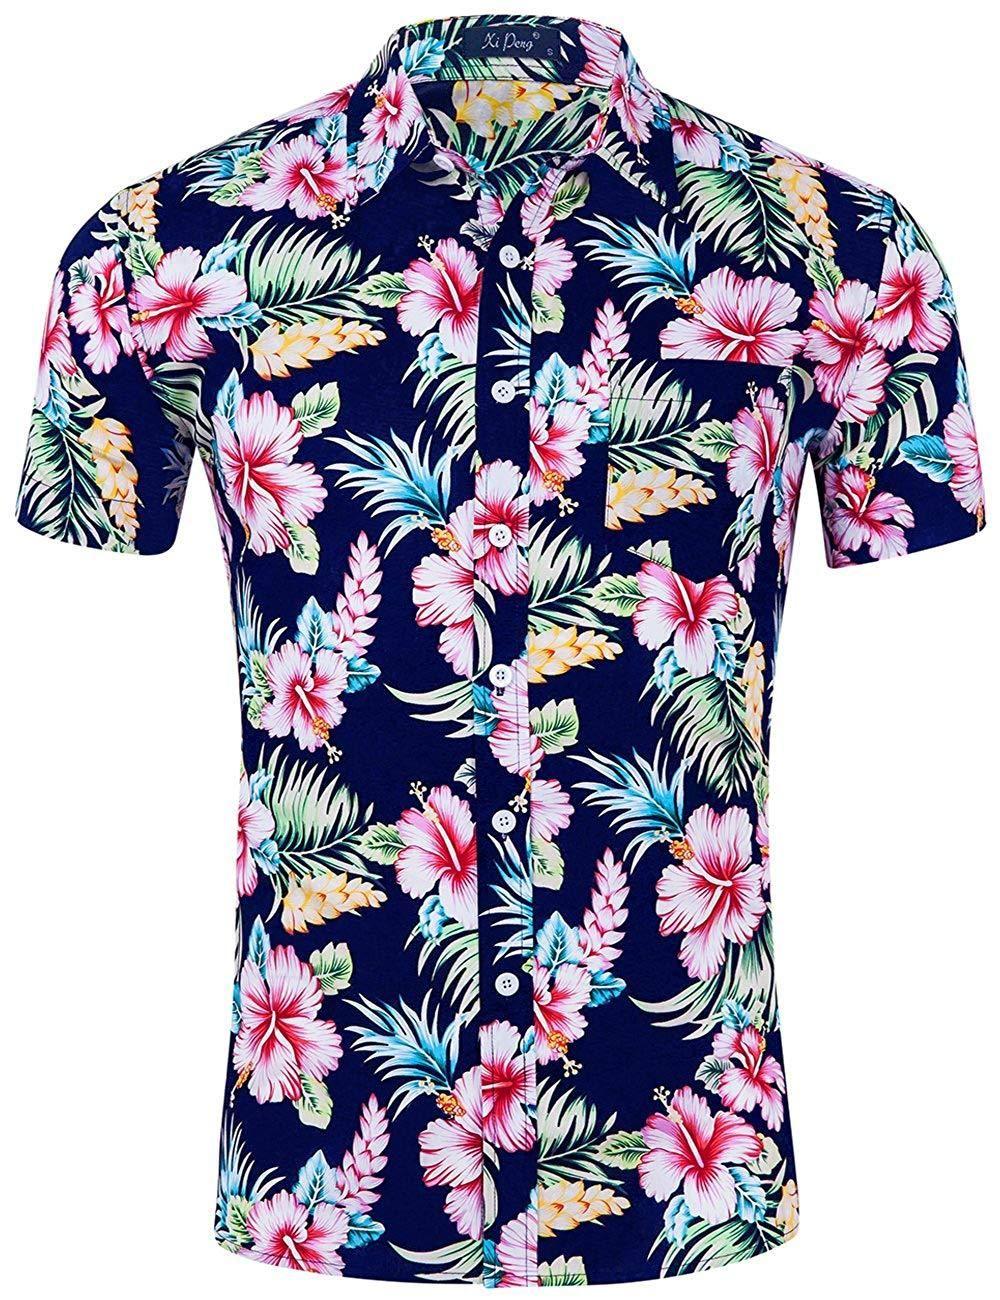 Hawaiian Mens Short Sleeve Casual Shirts Flower Floral Printed Dress Shirt Tops